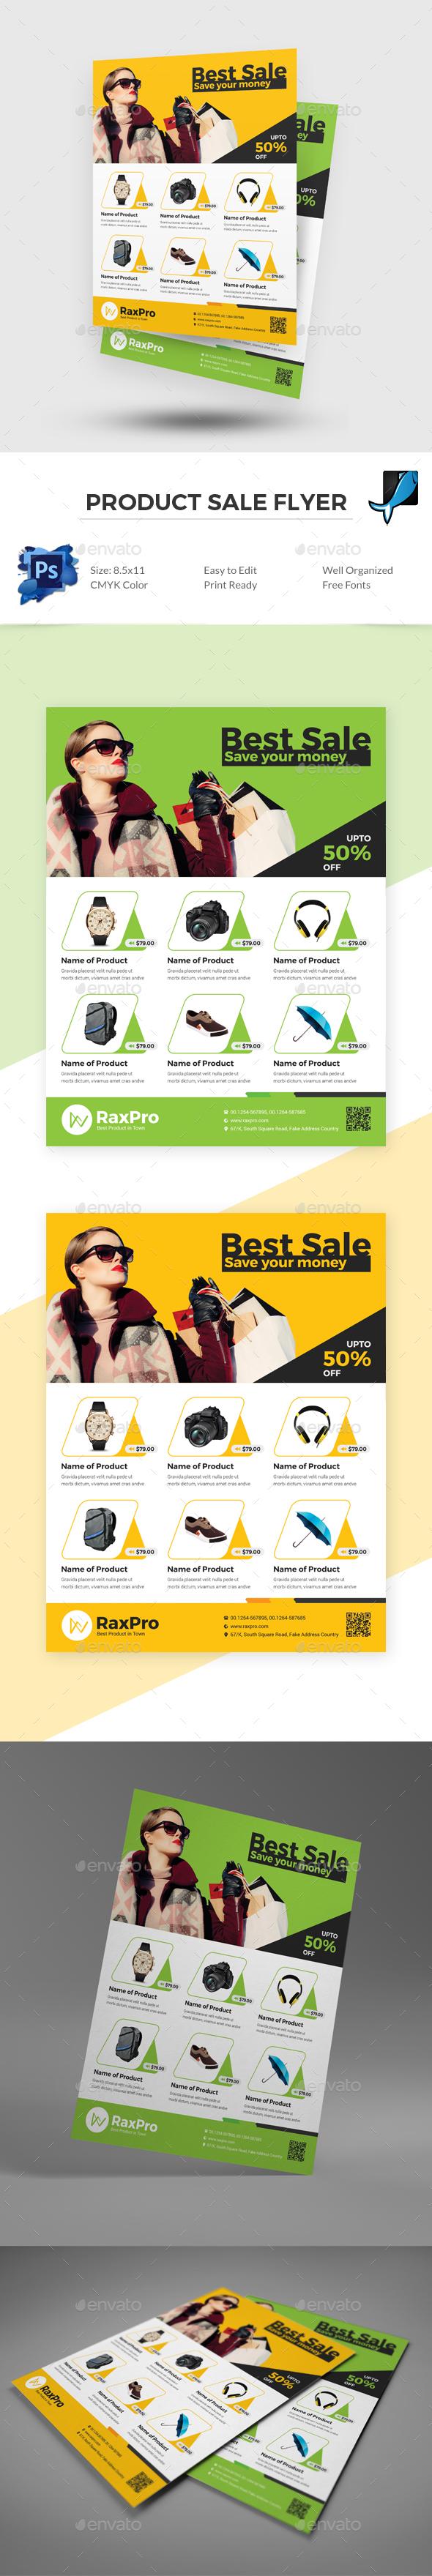 Product Sale Flyer - Commerce Flyers